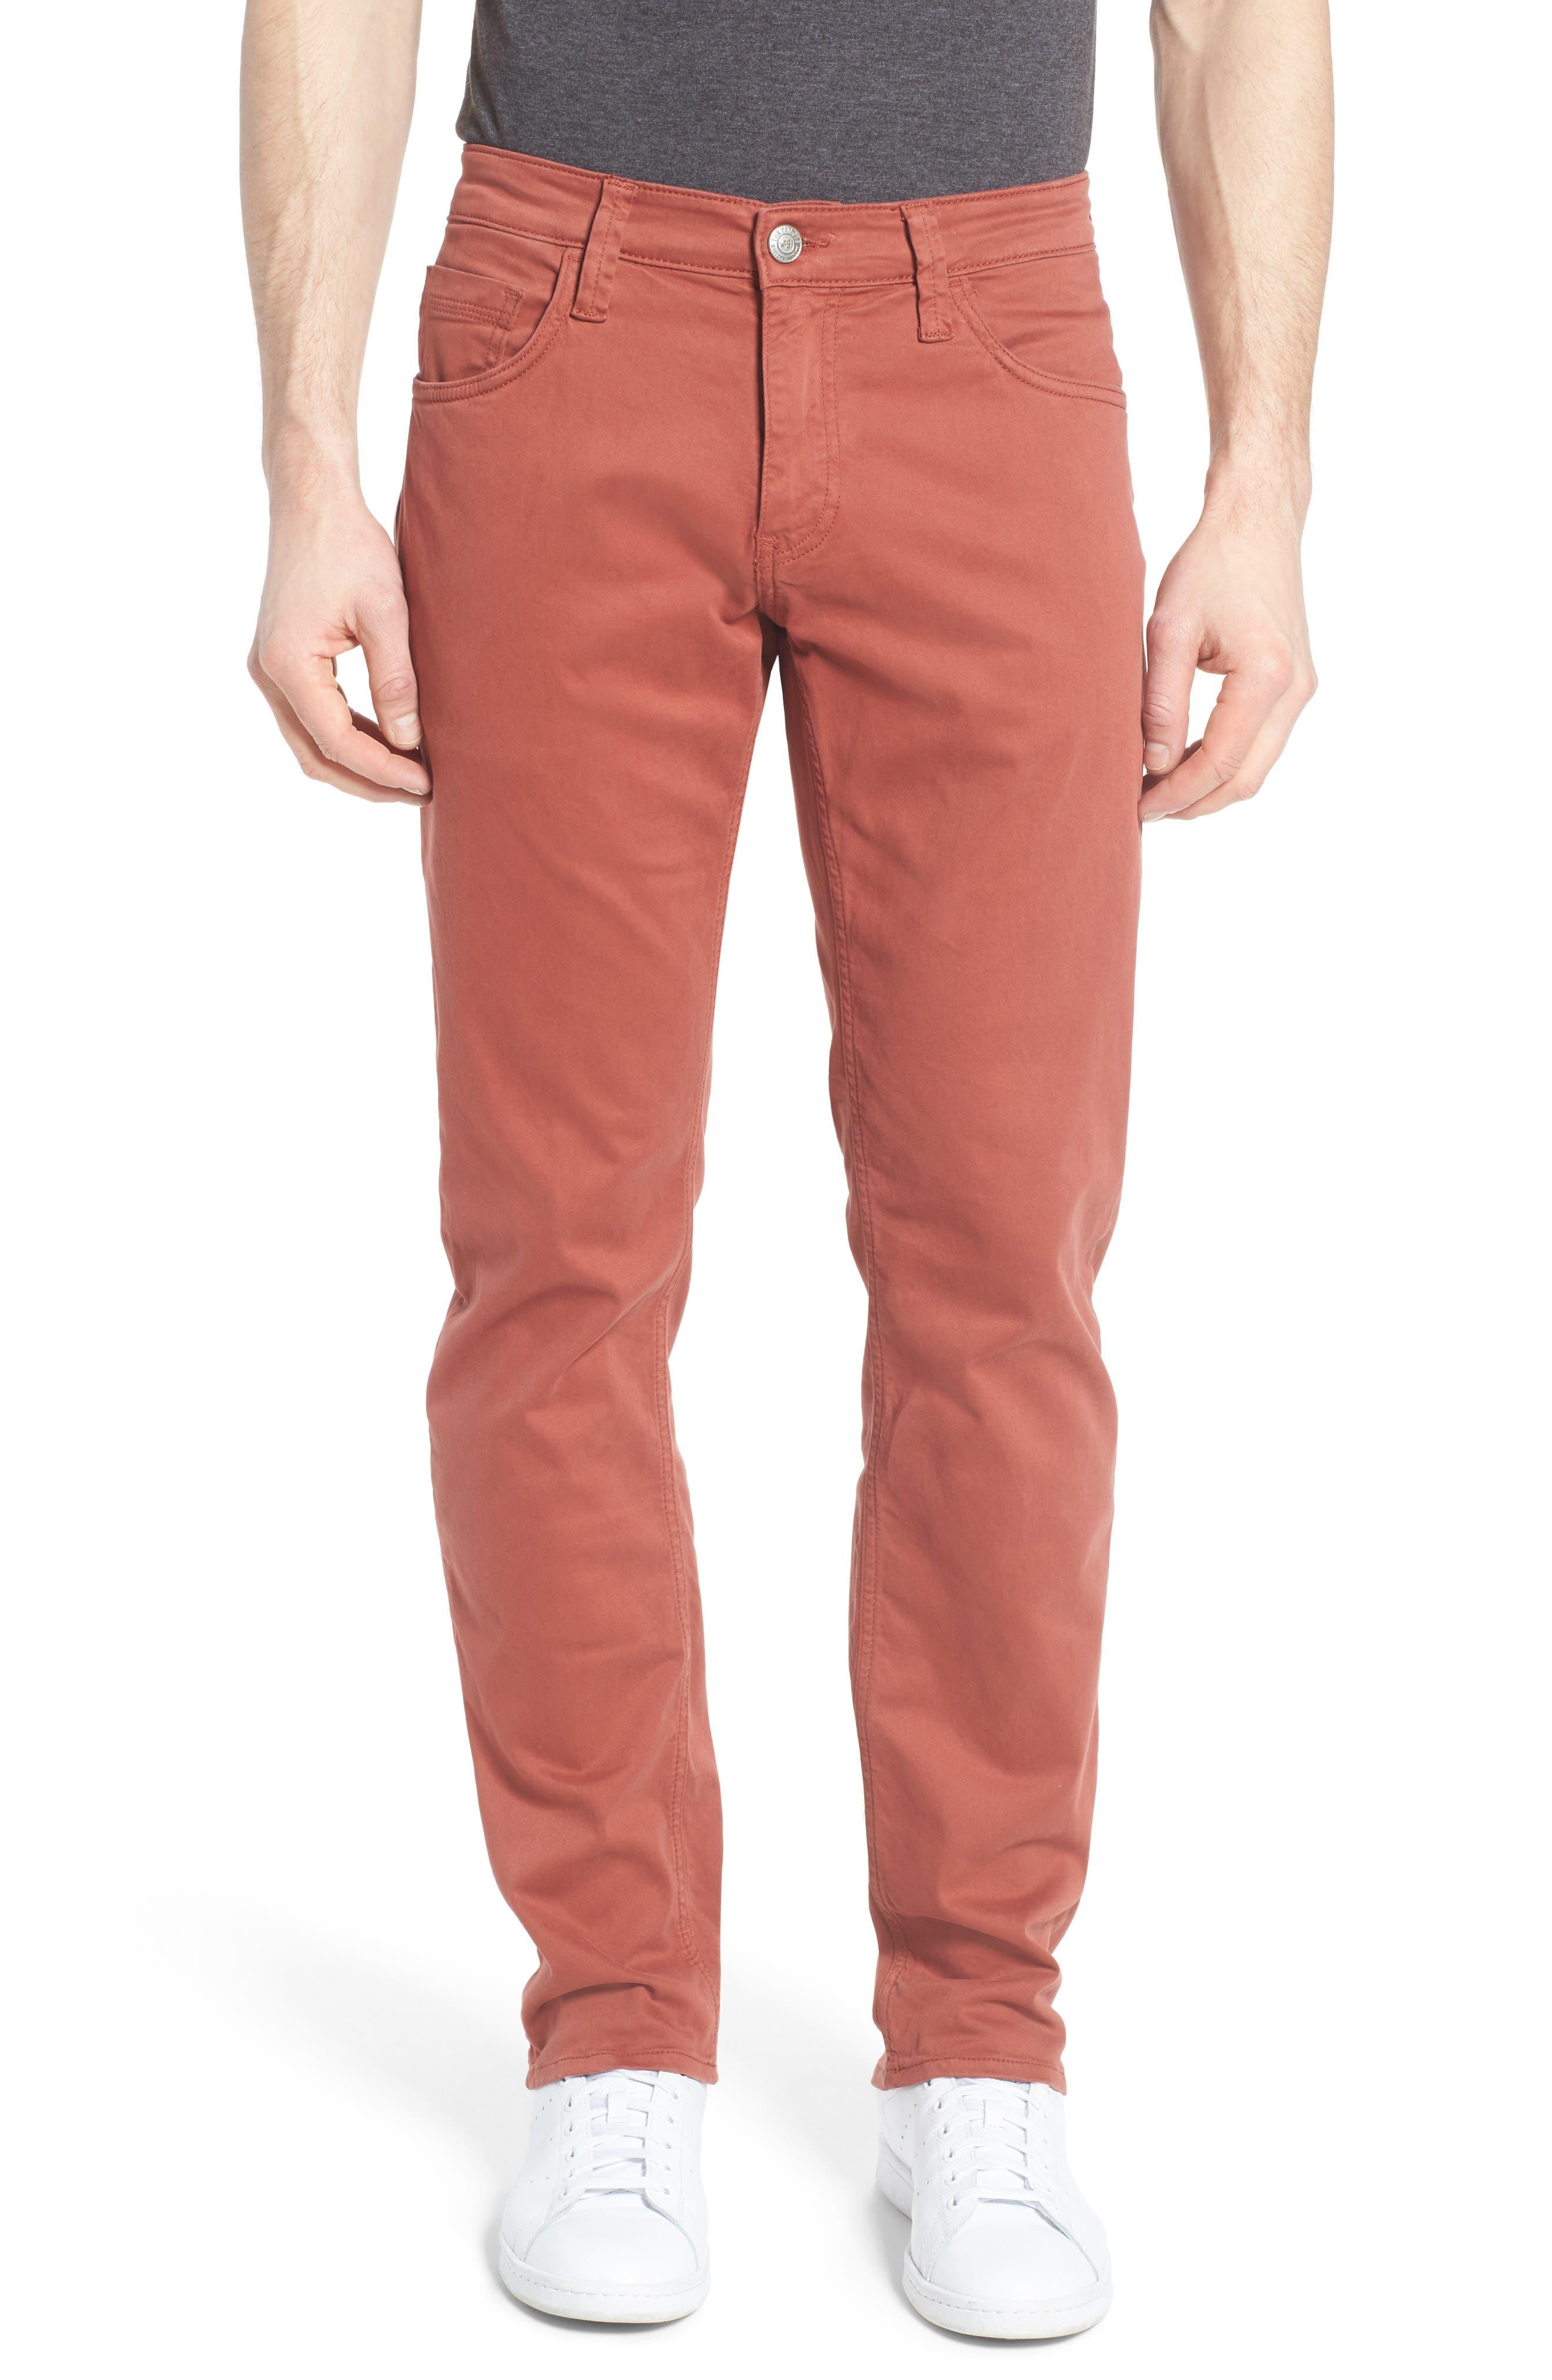 Zach Straight Leg Jeans,                             Main thumbnail 1, color,                             600